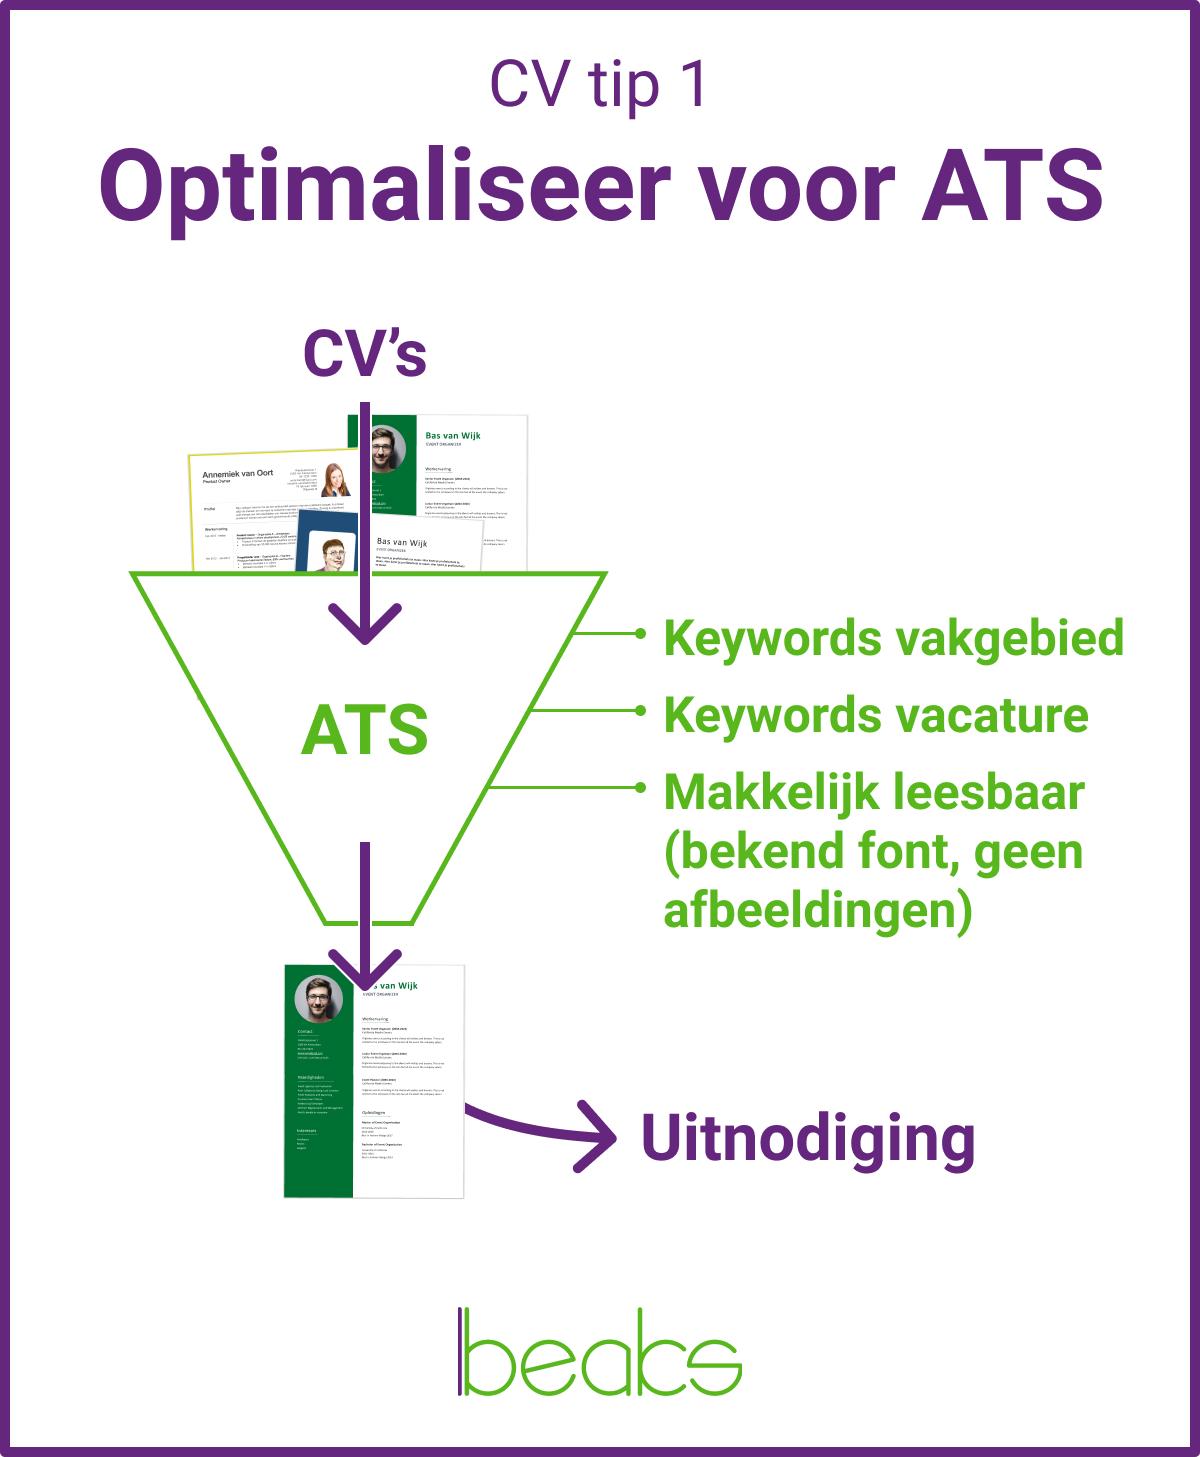 CV tip 1 Optimaliseer voor ATS